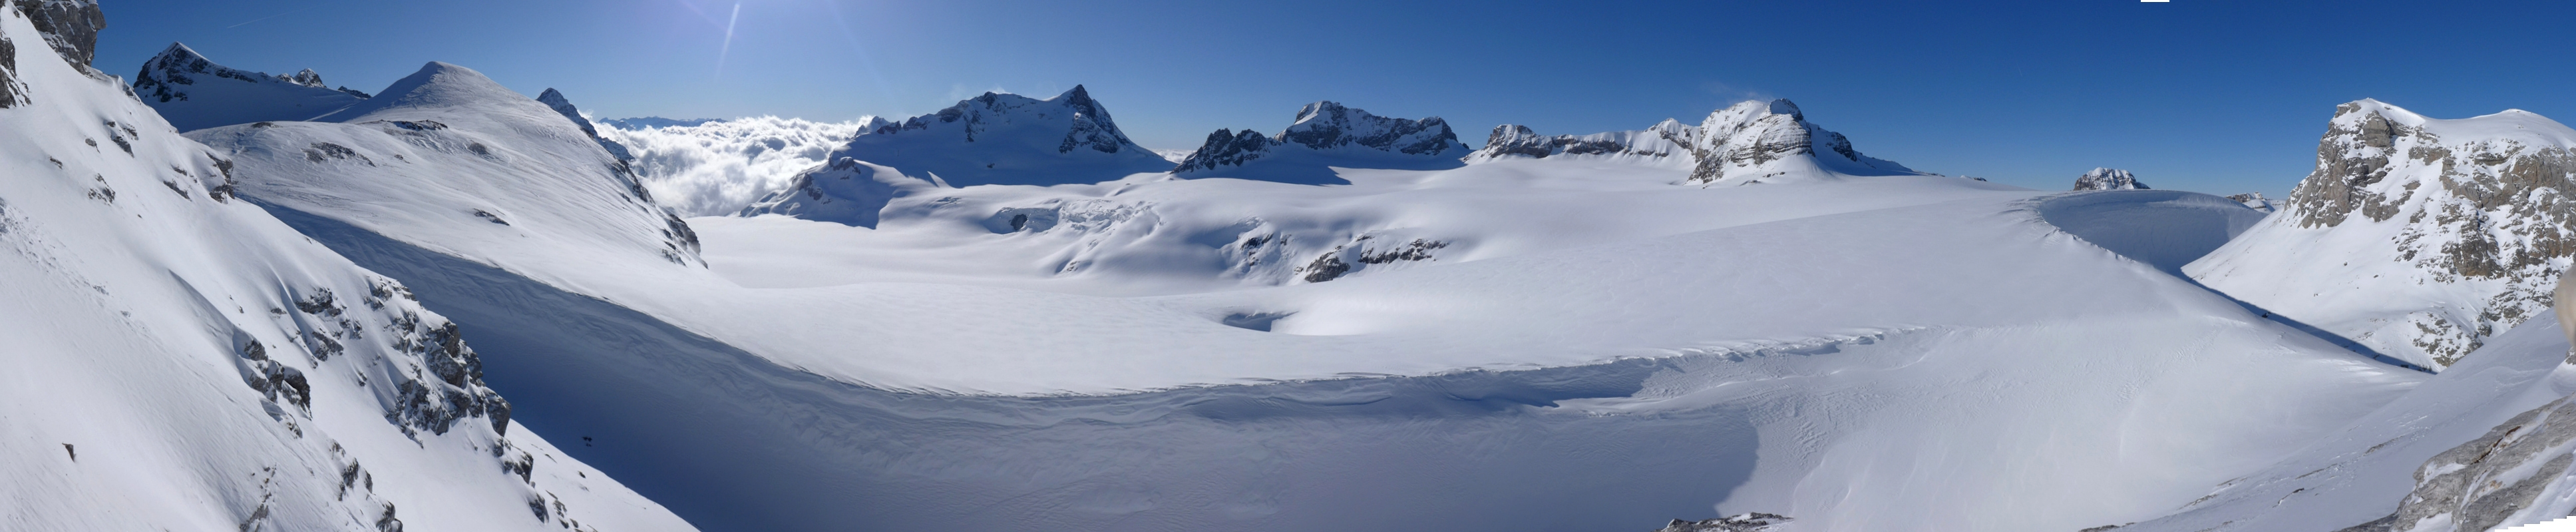 Clariden S, from Planurahütte Glarner Alpen Switzerland panorama 20